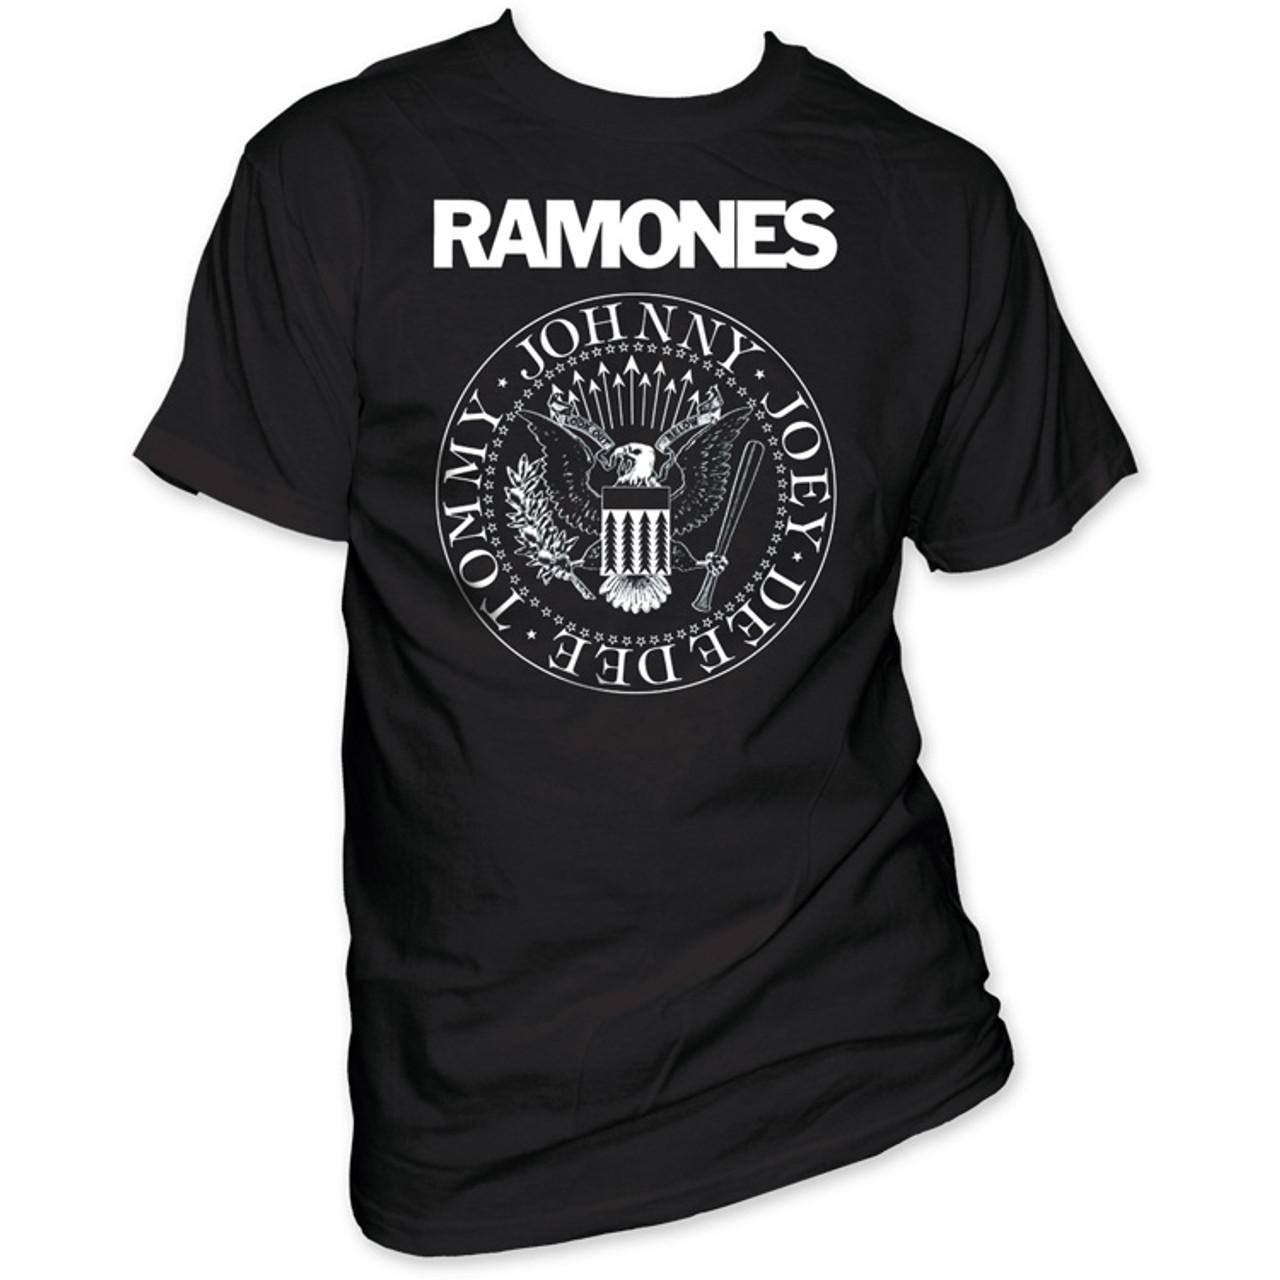 83705d7a9dd5a Ramones T-shirt - Presidential Seal Logo. Men s Black Shirt - Rocker ...